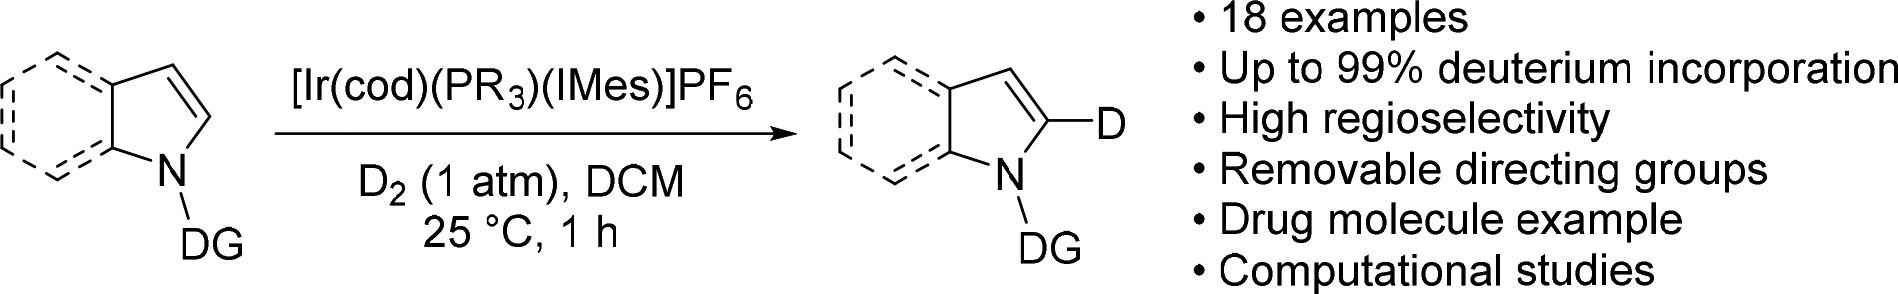 Site-Selective Deuteration of N-Heterocycles via Iridium-Catalyzed Hydrogen Isotope Exchange - ACS Catal. 2017, 7, 7182.